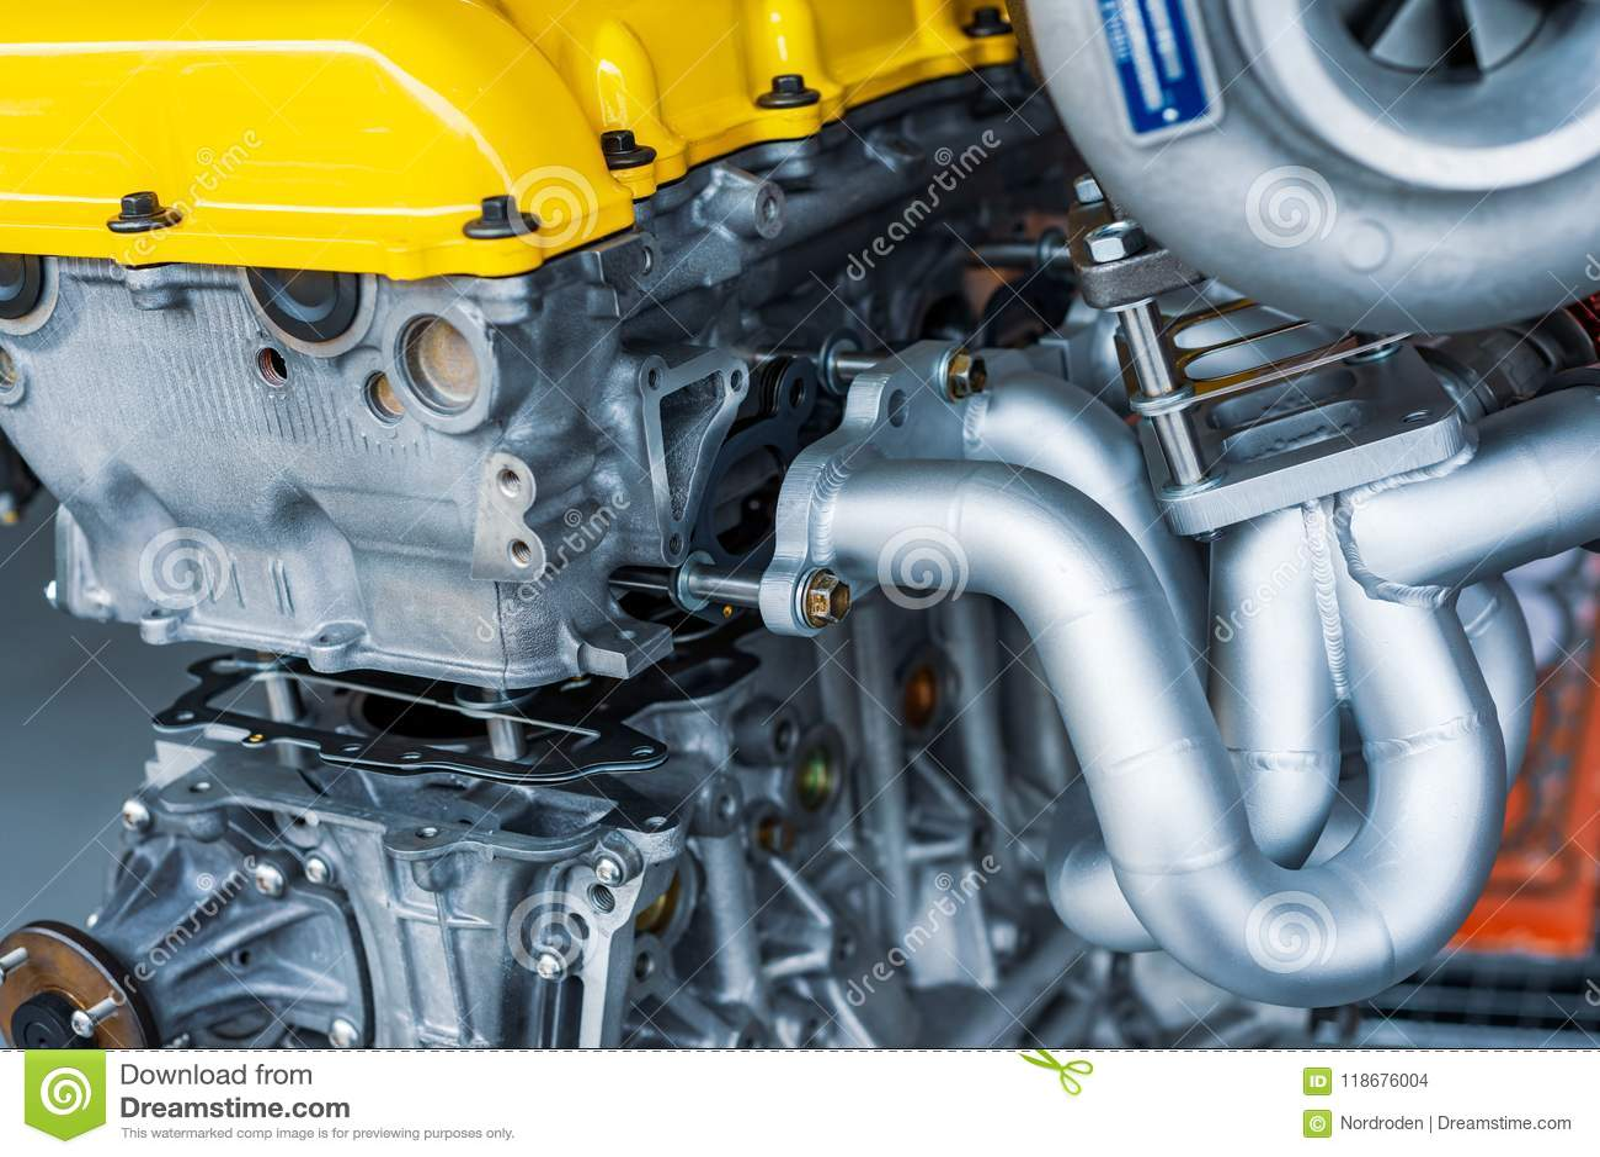 Motore a combustione interna automobilistico